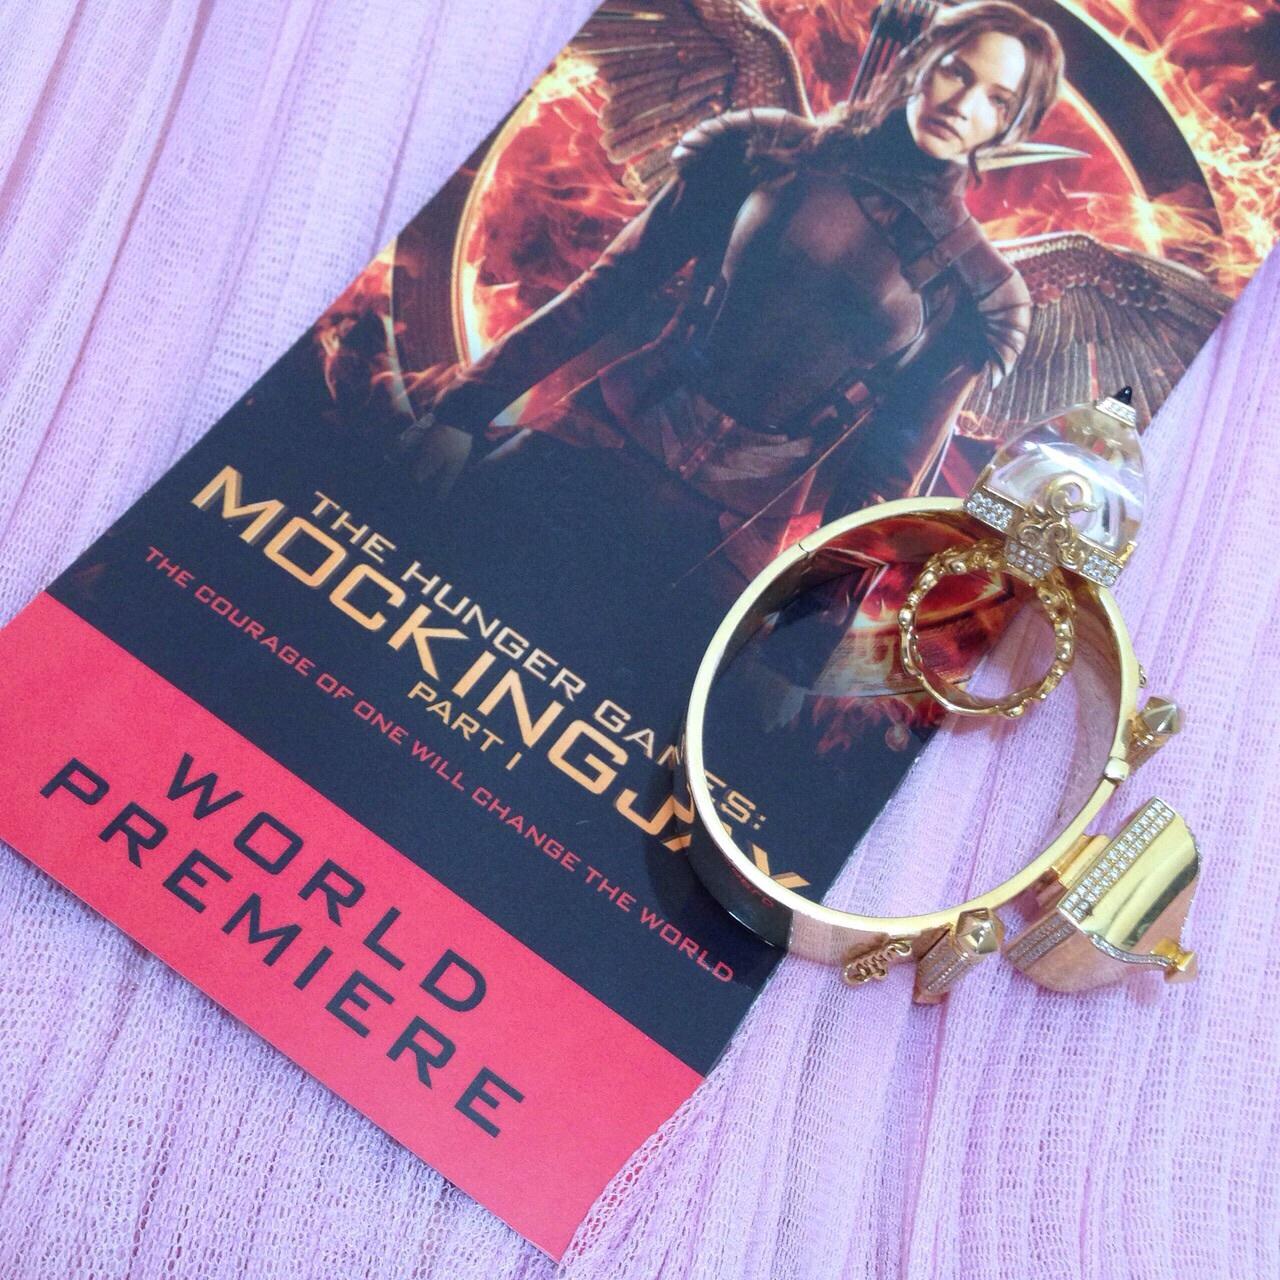 Hunger Games Mockingjay Part 1 Premiere